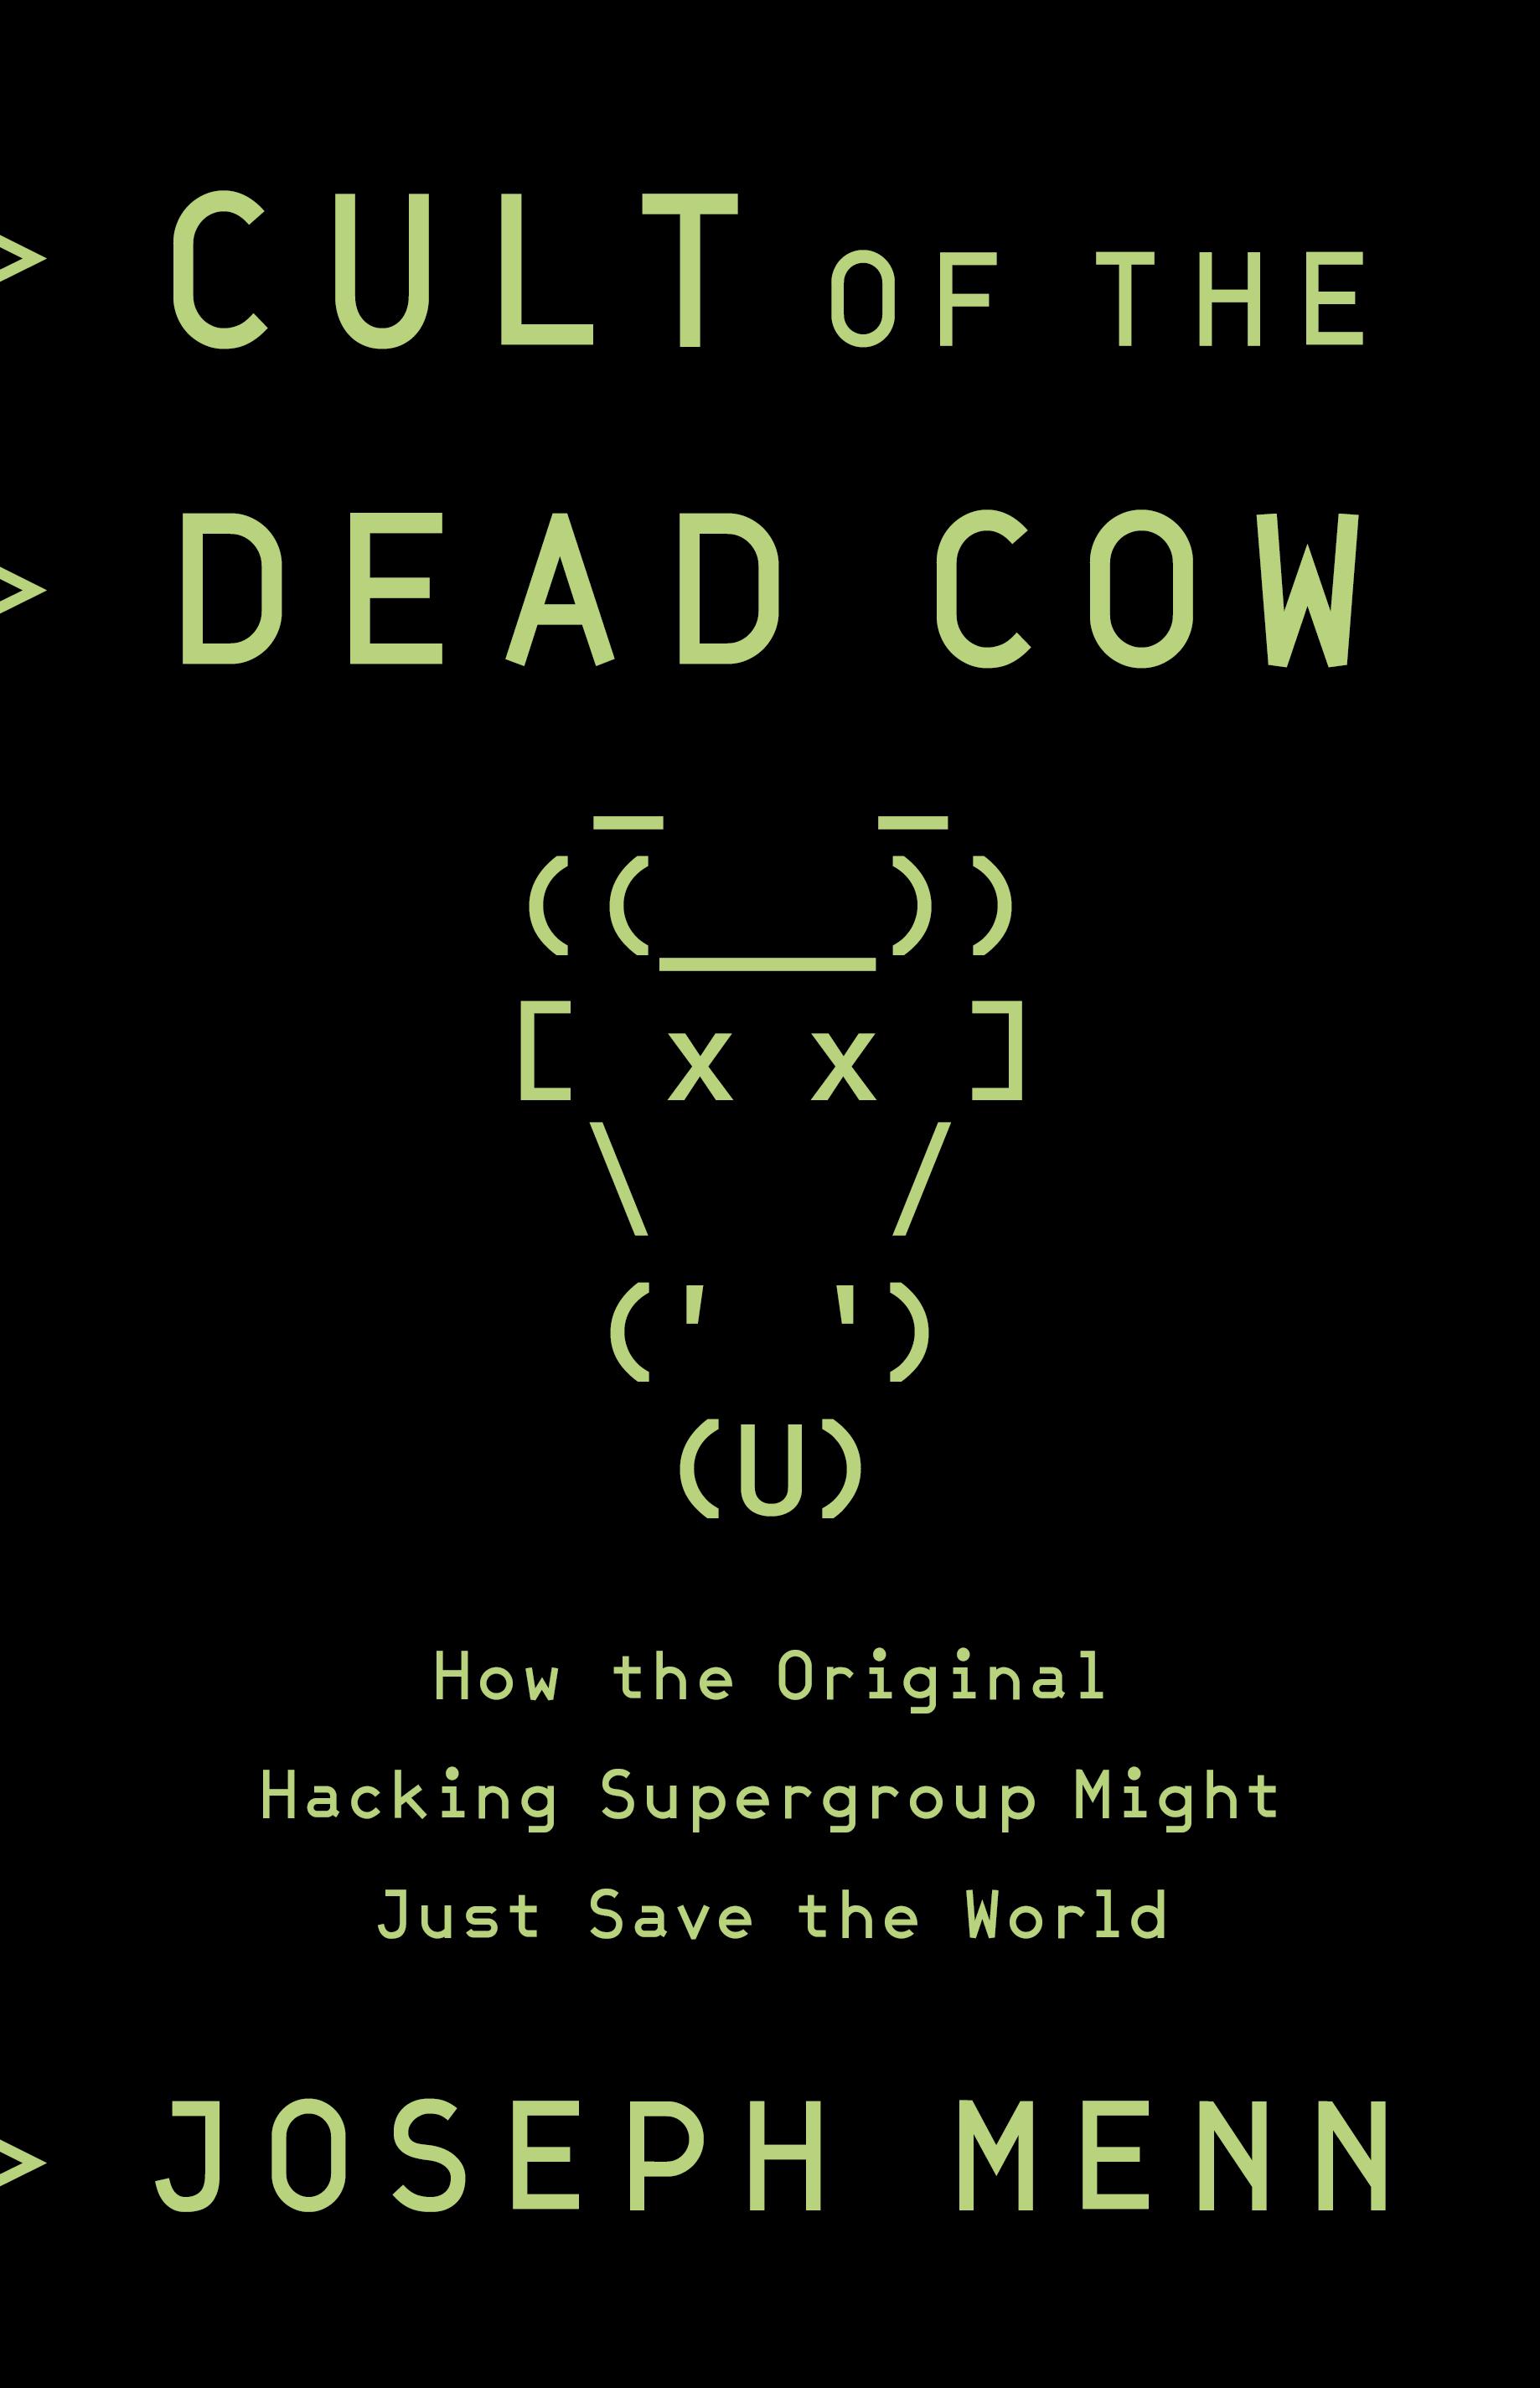 Cult of the Dead Cow by Joseph Menn